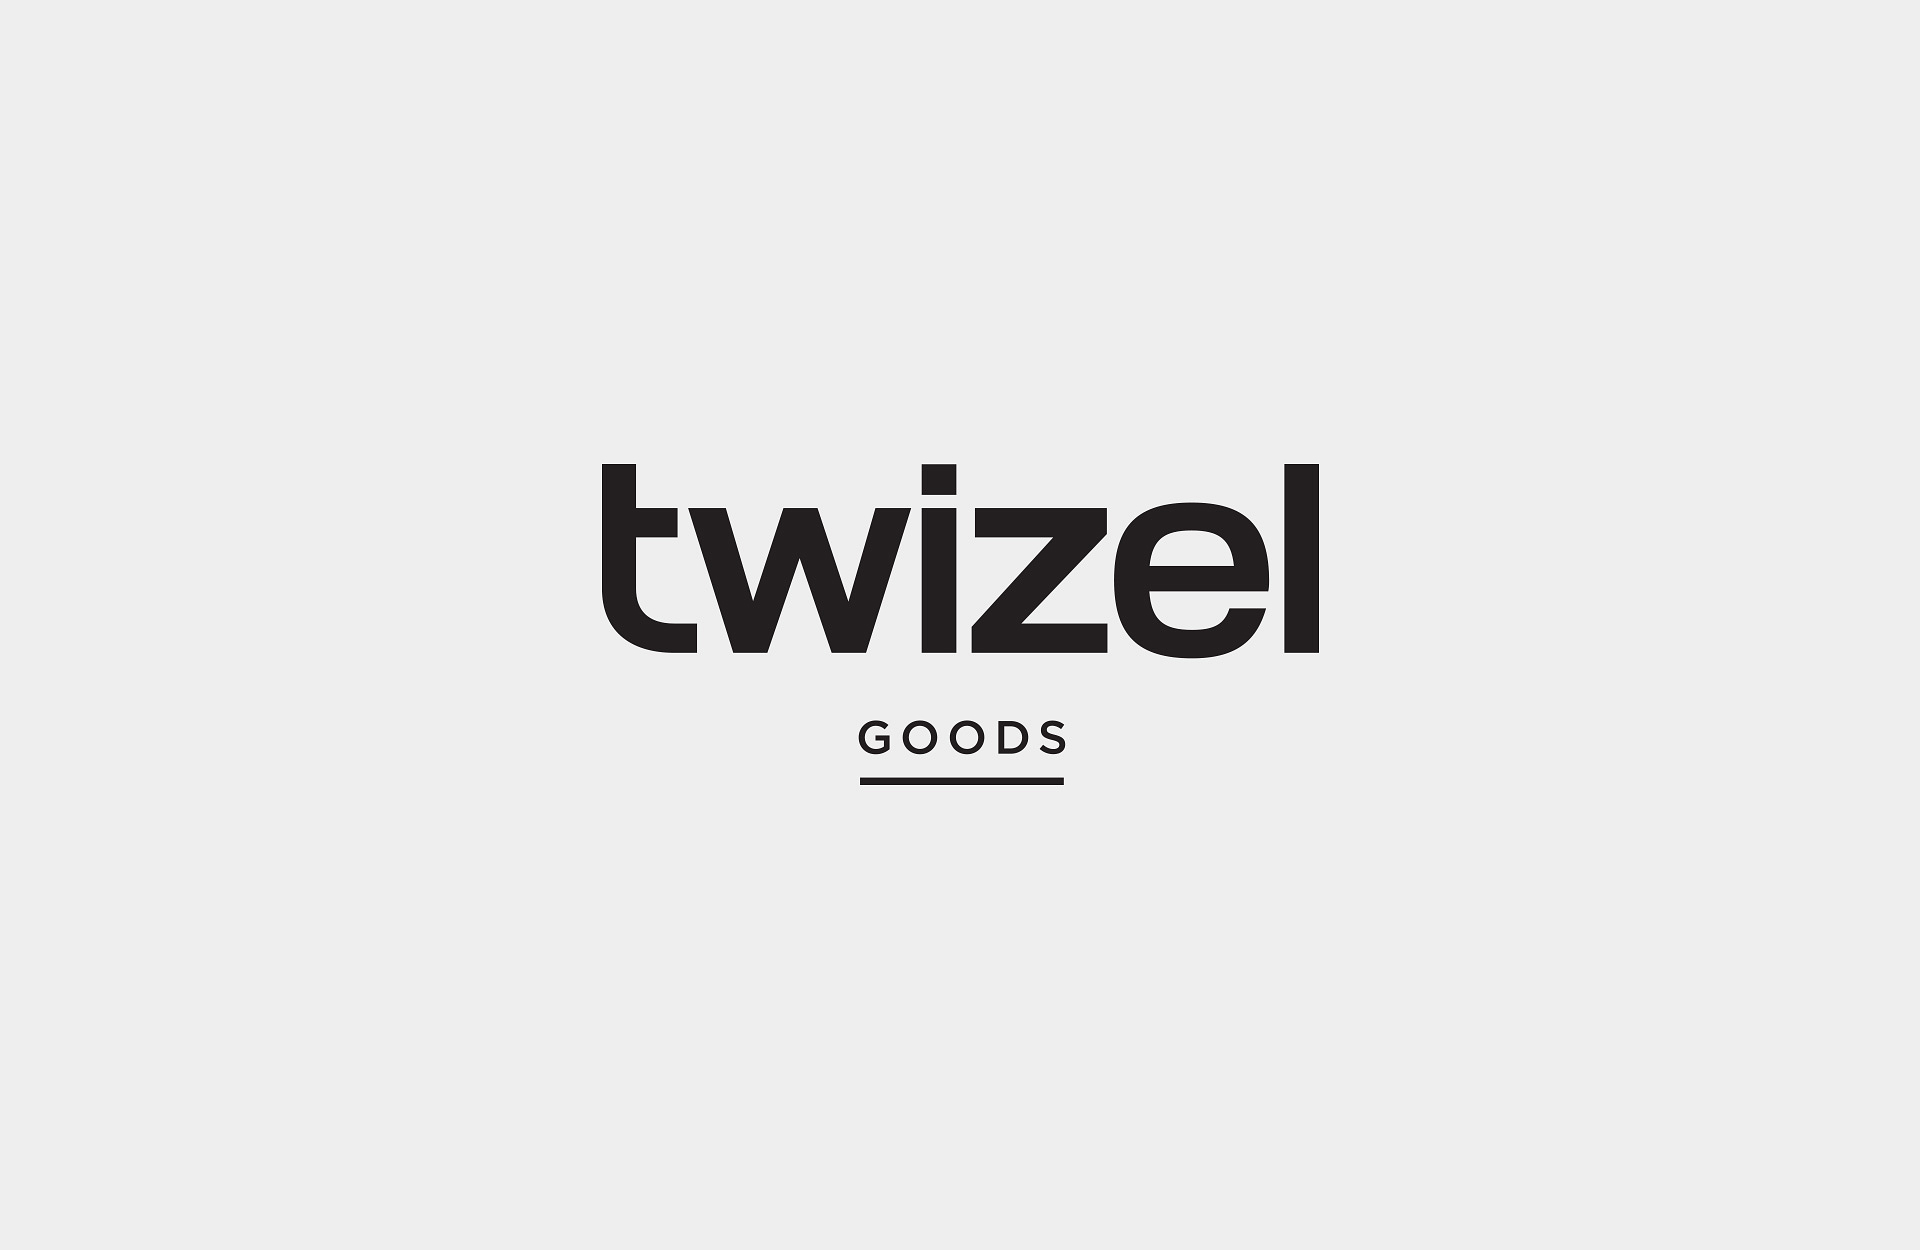 TWIZ_set_1-2